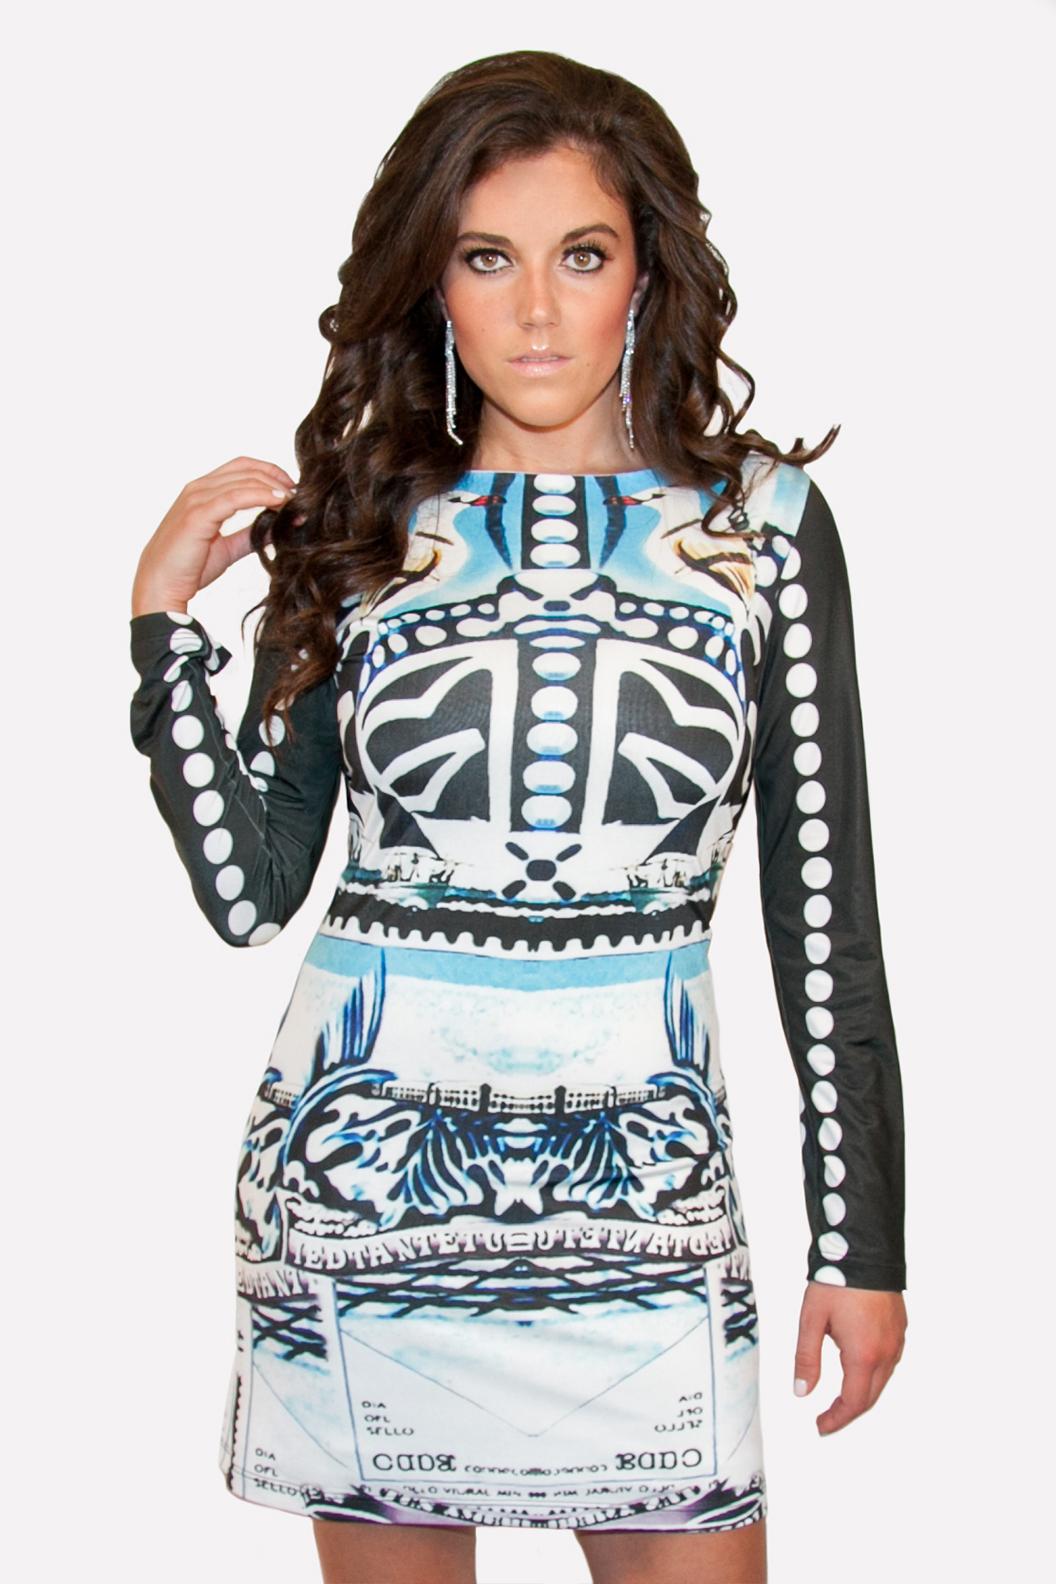 Retro pattern stretch dress by LaPateau